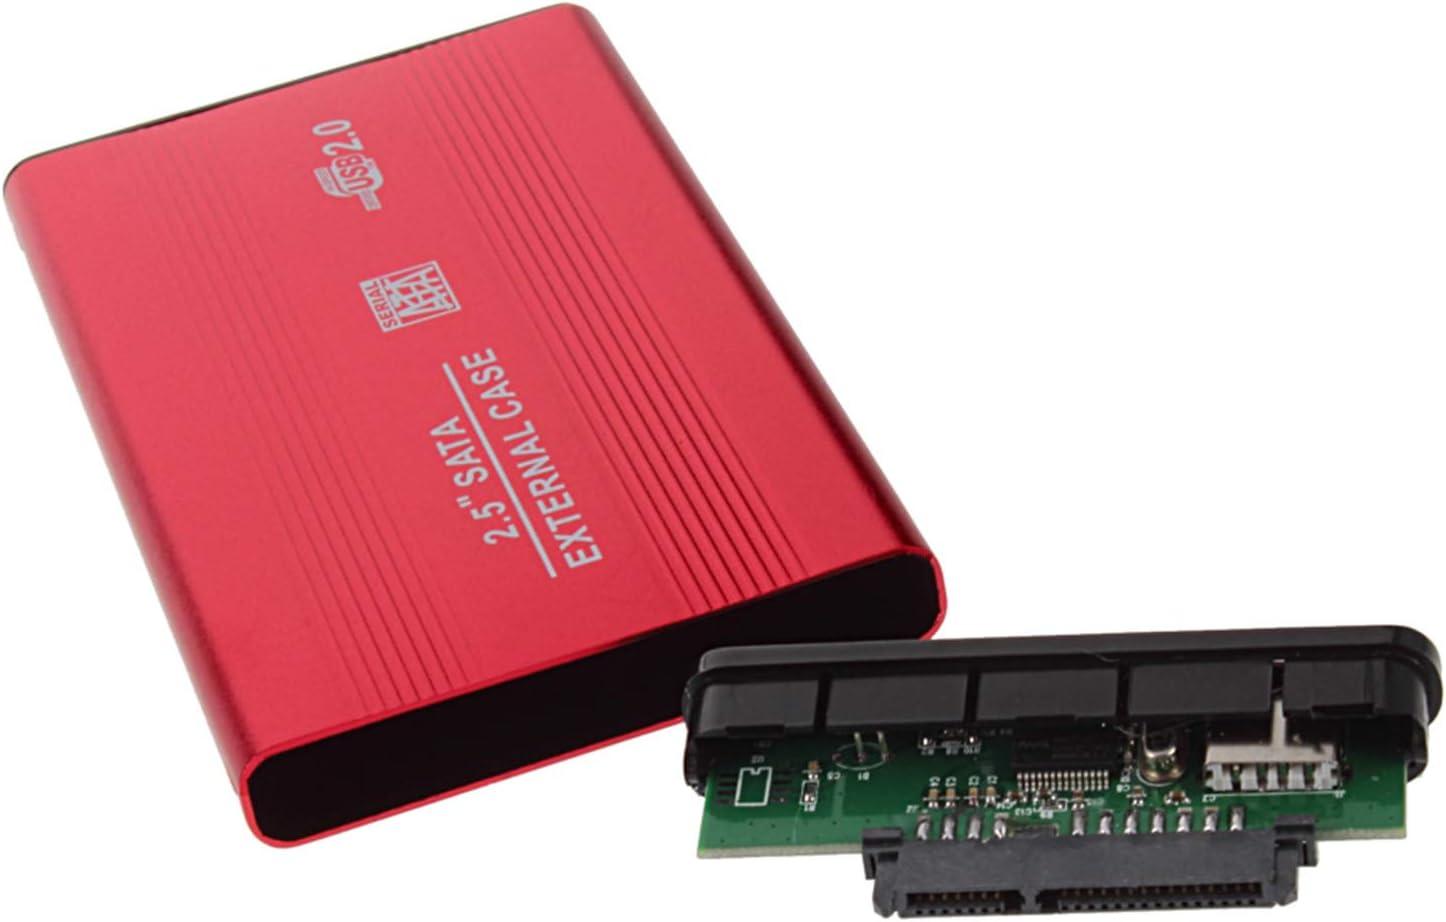 USB 2.0 2.5 Inch Shockproof USB 2.0 Aluminum External Storage SATA Hard Drive HDD Enclosure Box Case